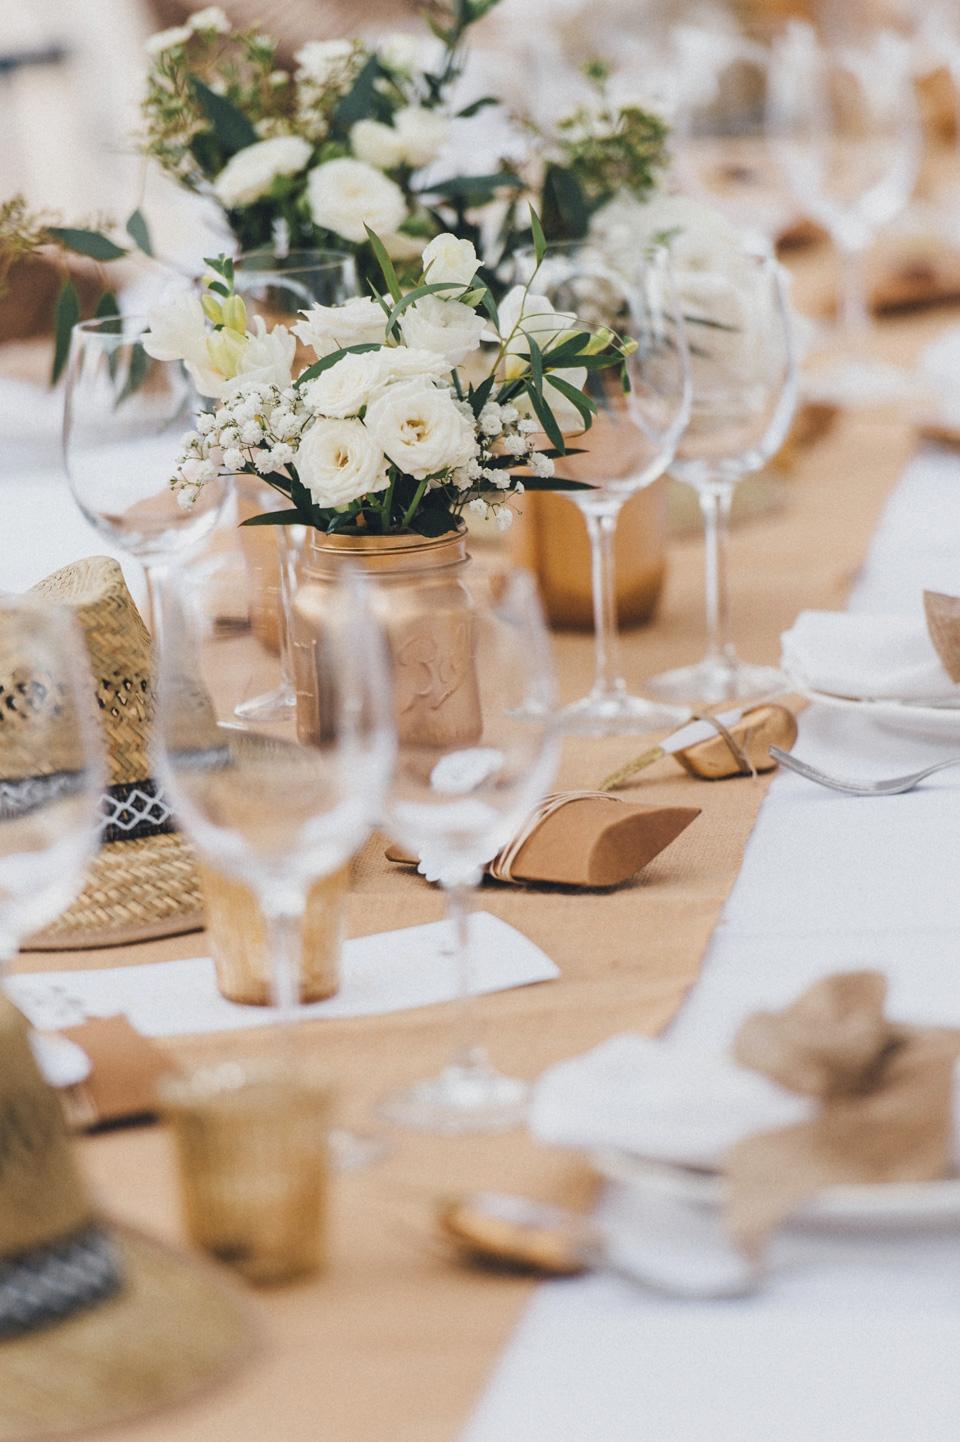 bohemian-ibiza-kreativ-wedding_0098 hochzeitsfotograf hochzeitsvideo ibiza bohemian weddingSaskia & Pierre Bohemian Bohemian Ibiza Weddingbohemian ibiza kreativ wedding 0098